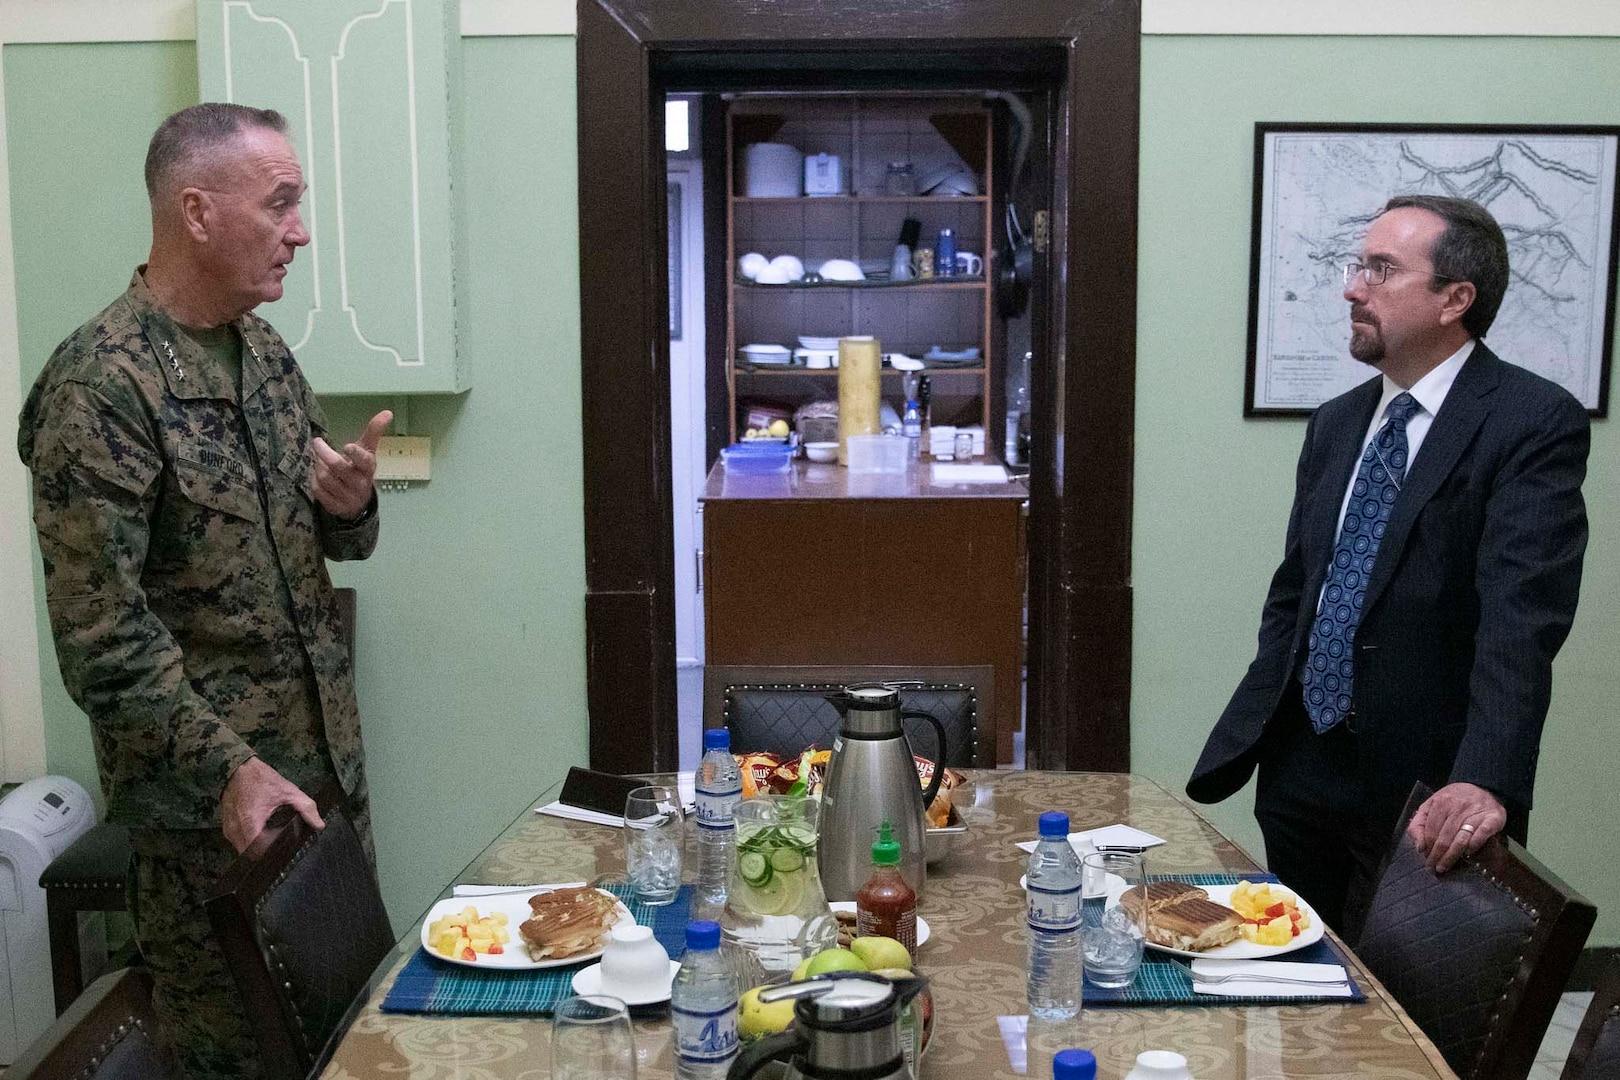 General speaks with civilian.